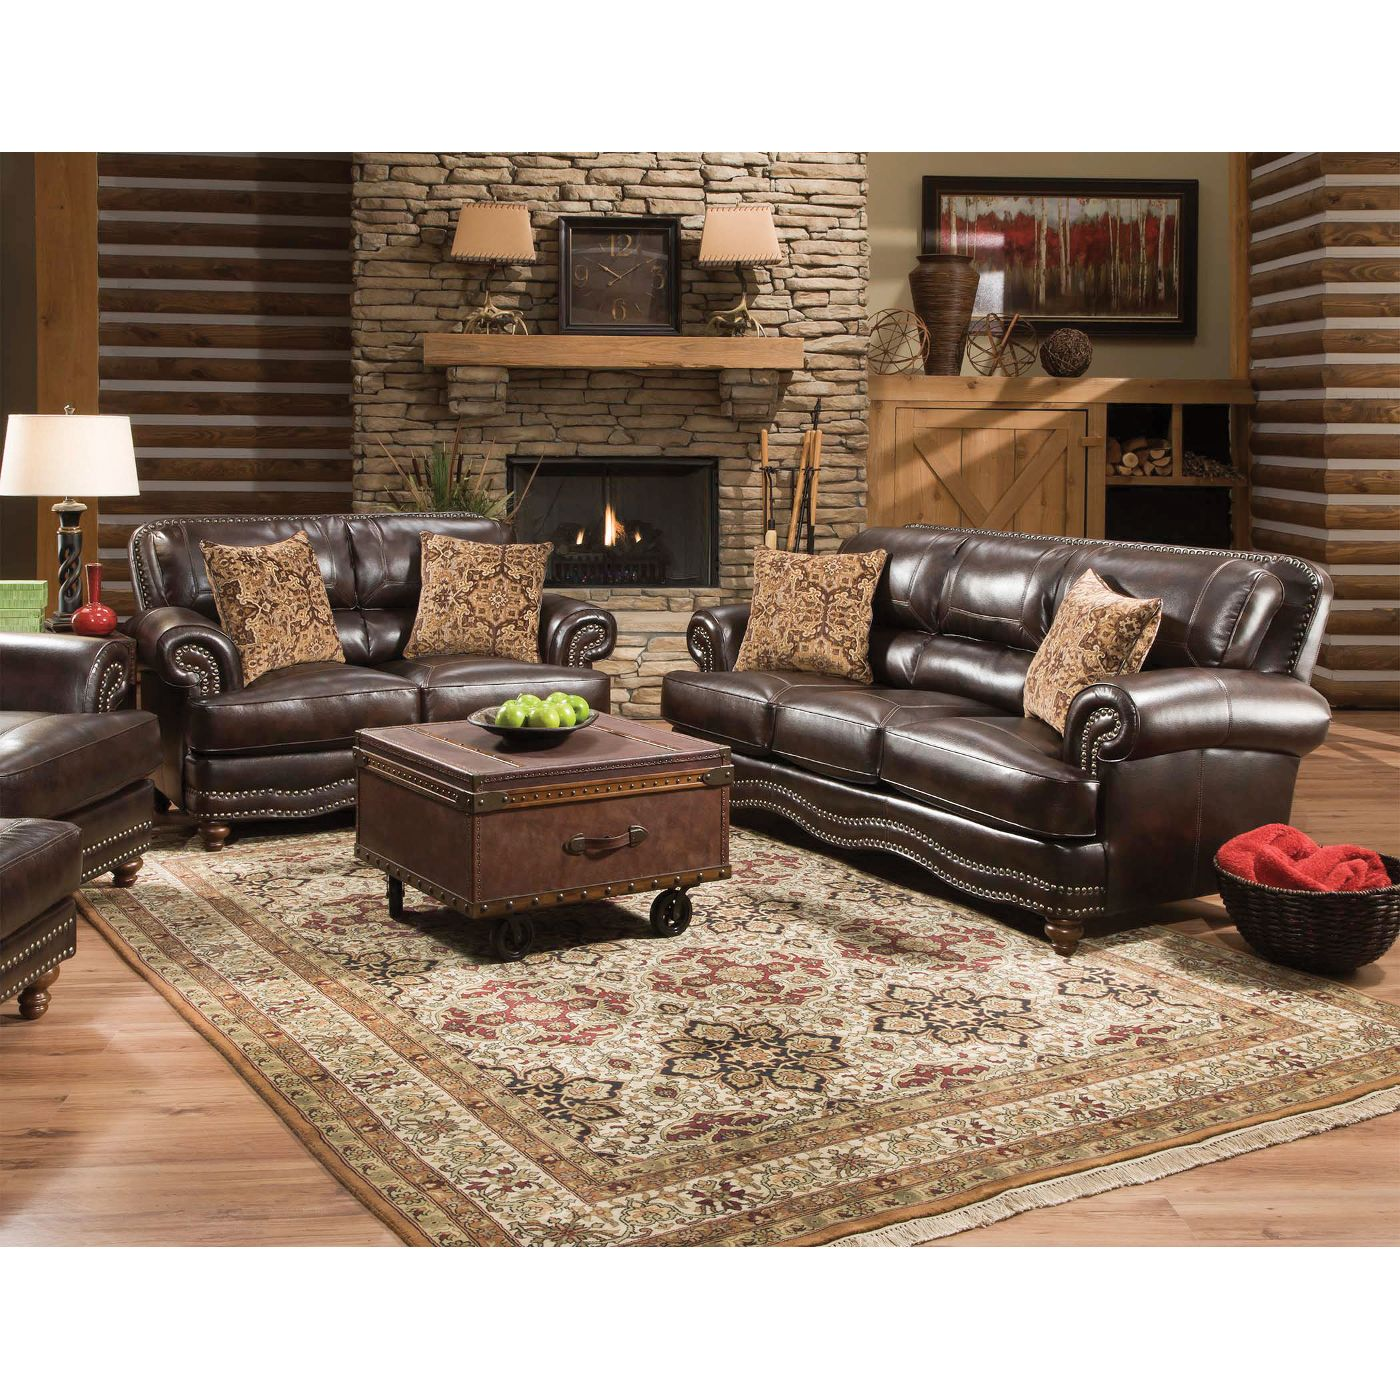 Bentley Living Room - Sofa, Loveseat, Chair & Ottoman (12A)  Love